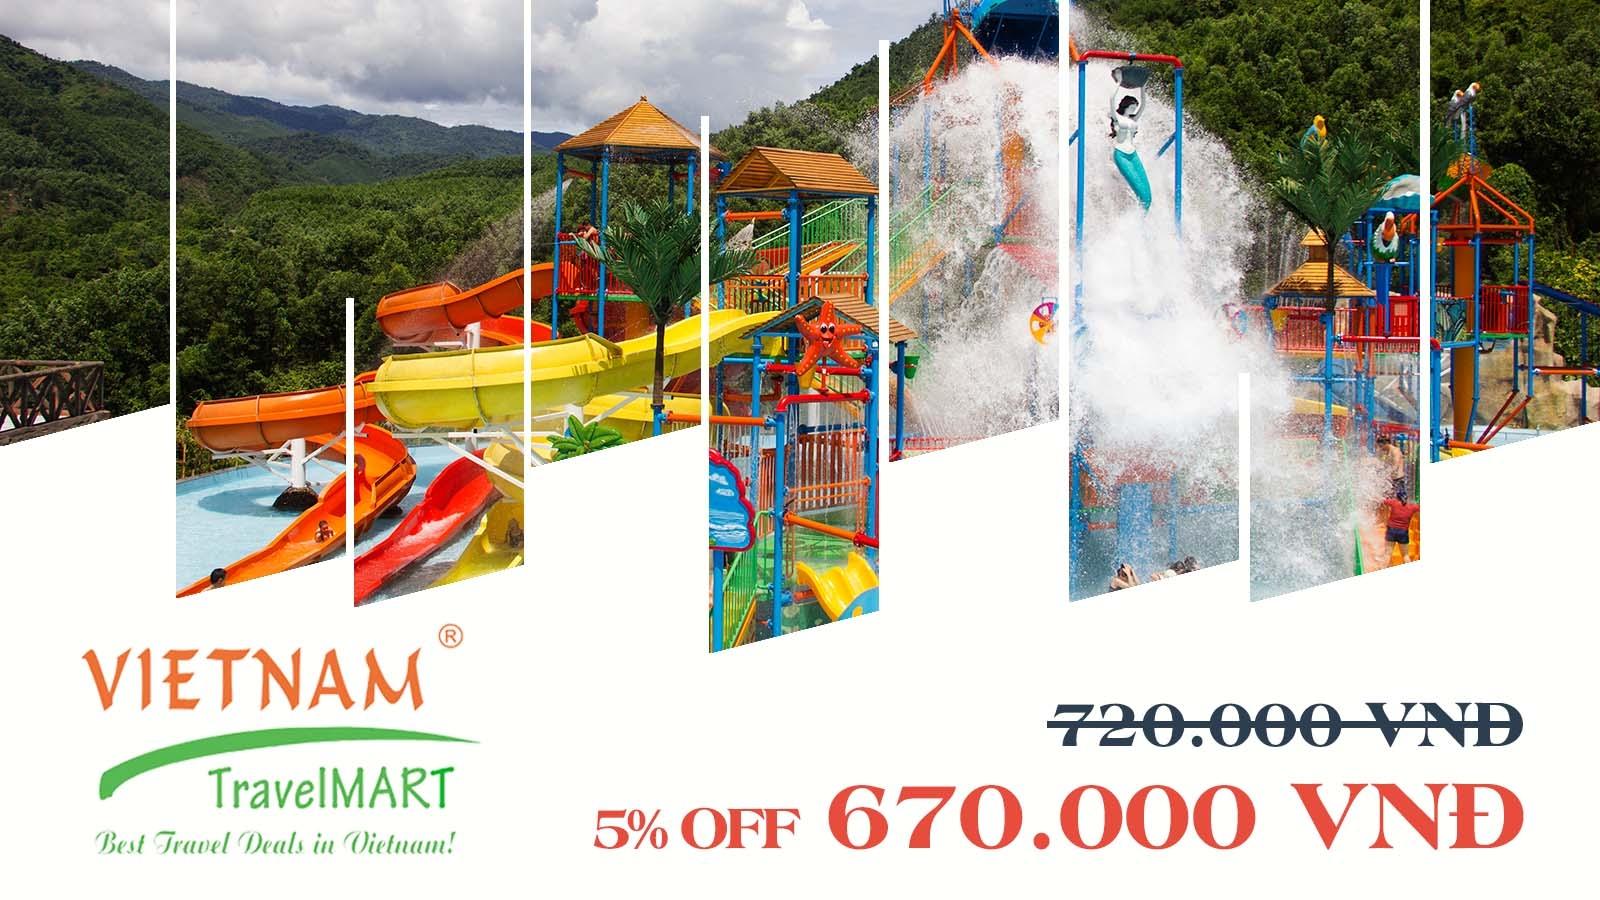 VIETNAM TRAVELMART JSC | 5% OFF THAN TAI HOT SPRING PARK DAILY TOUR